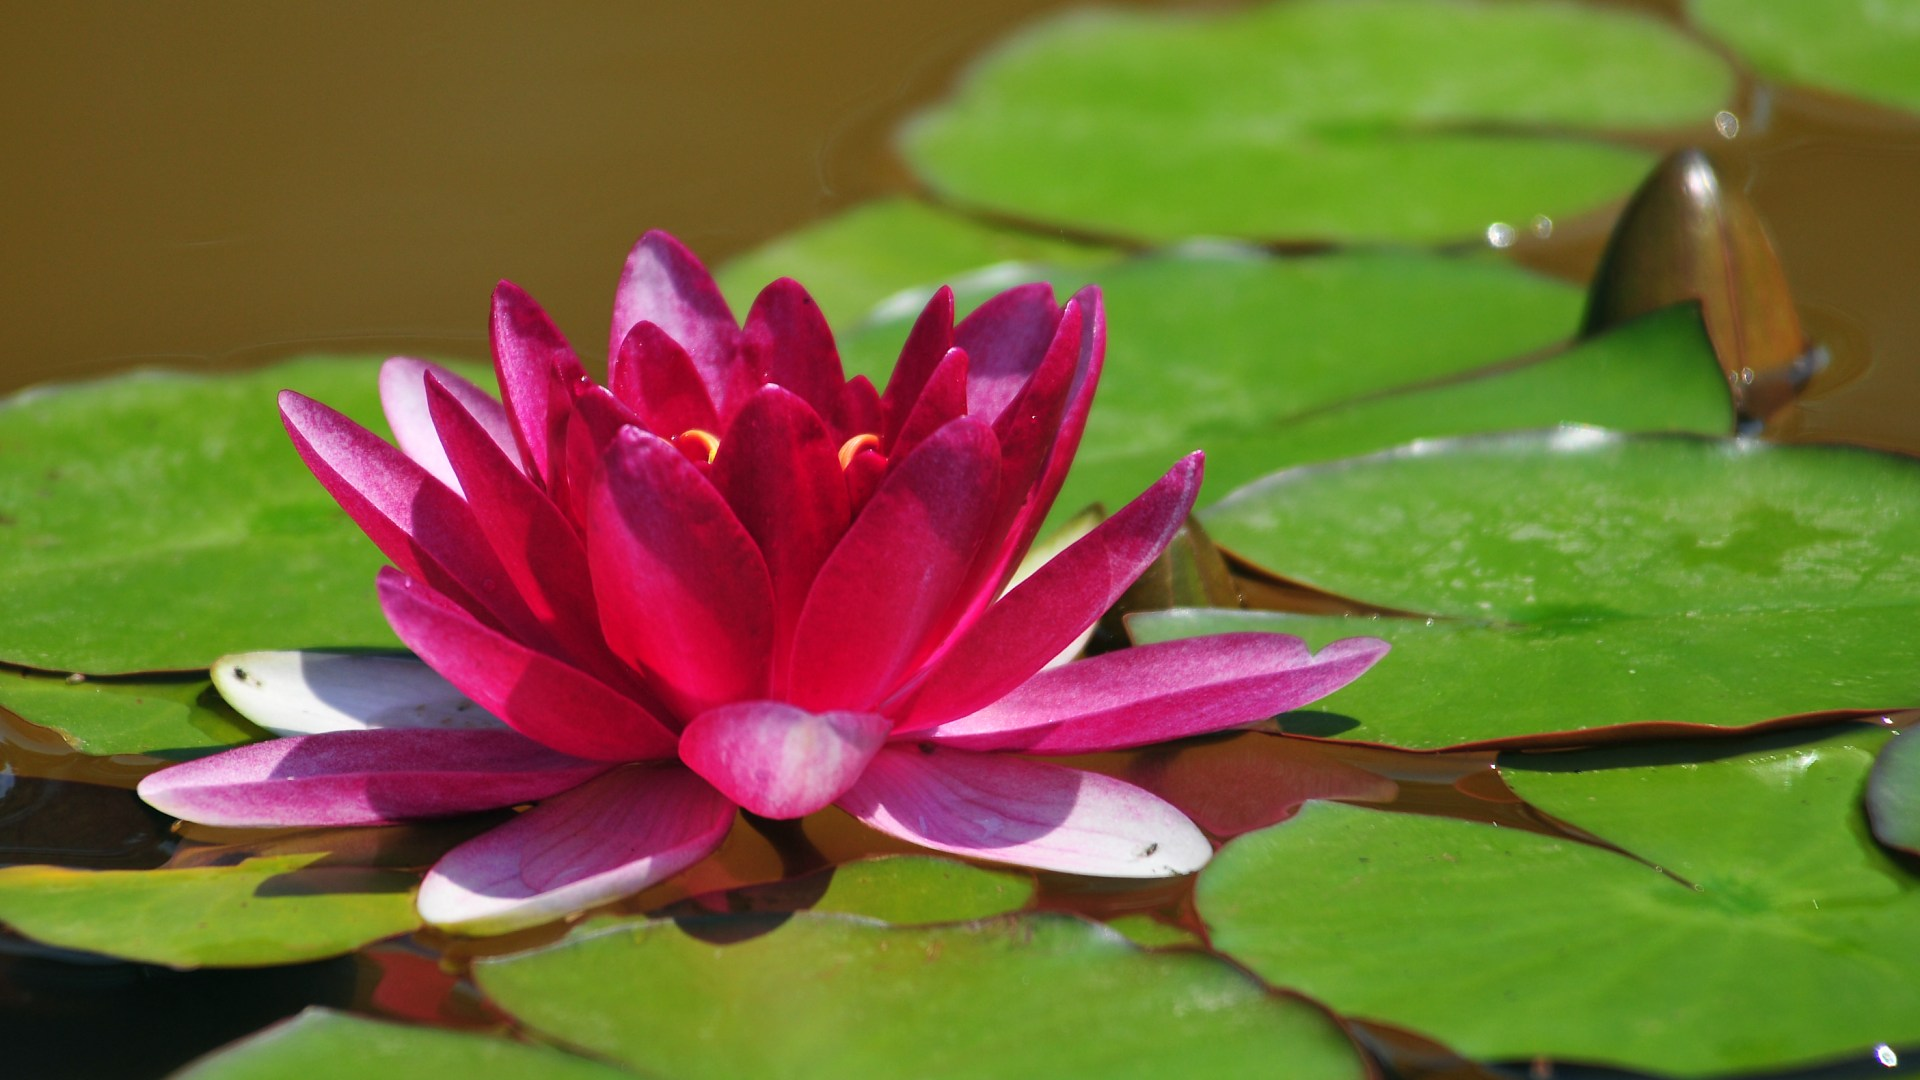 Free Download Pink Lotus Flower Hd Wallpapers Pink Lotus Flower Images, Photos, Reviews